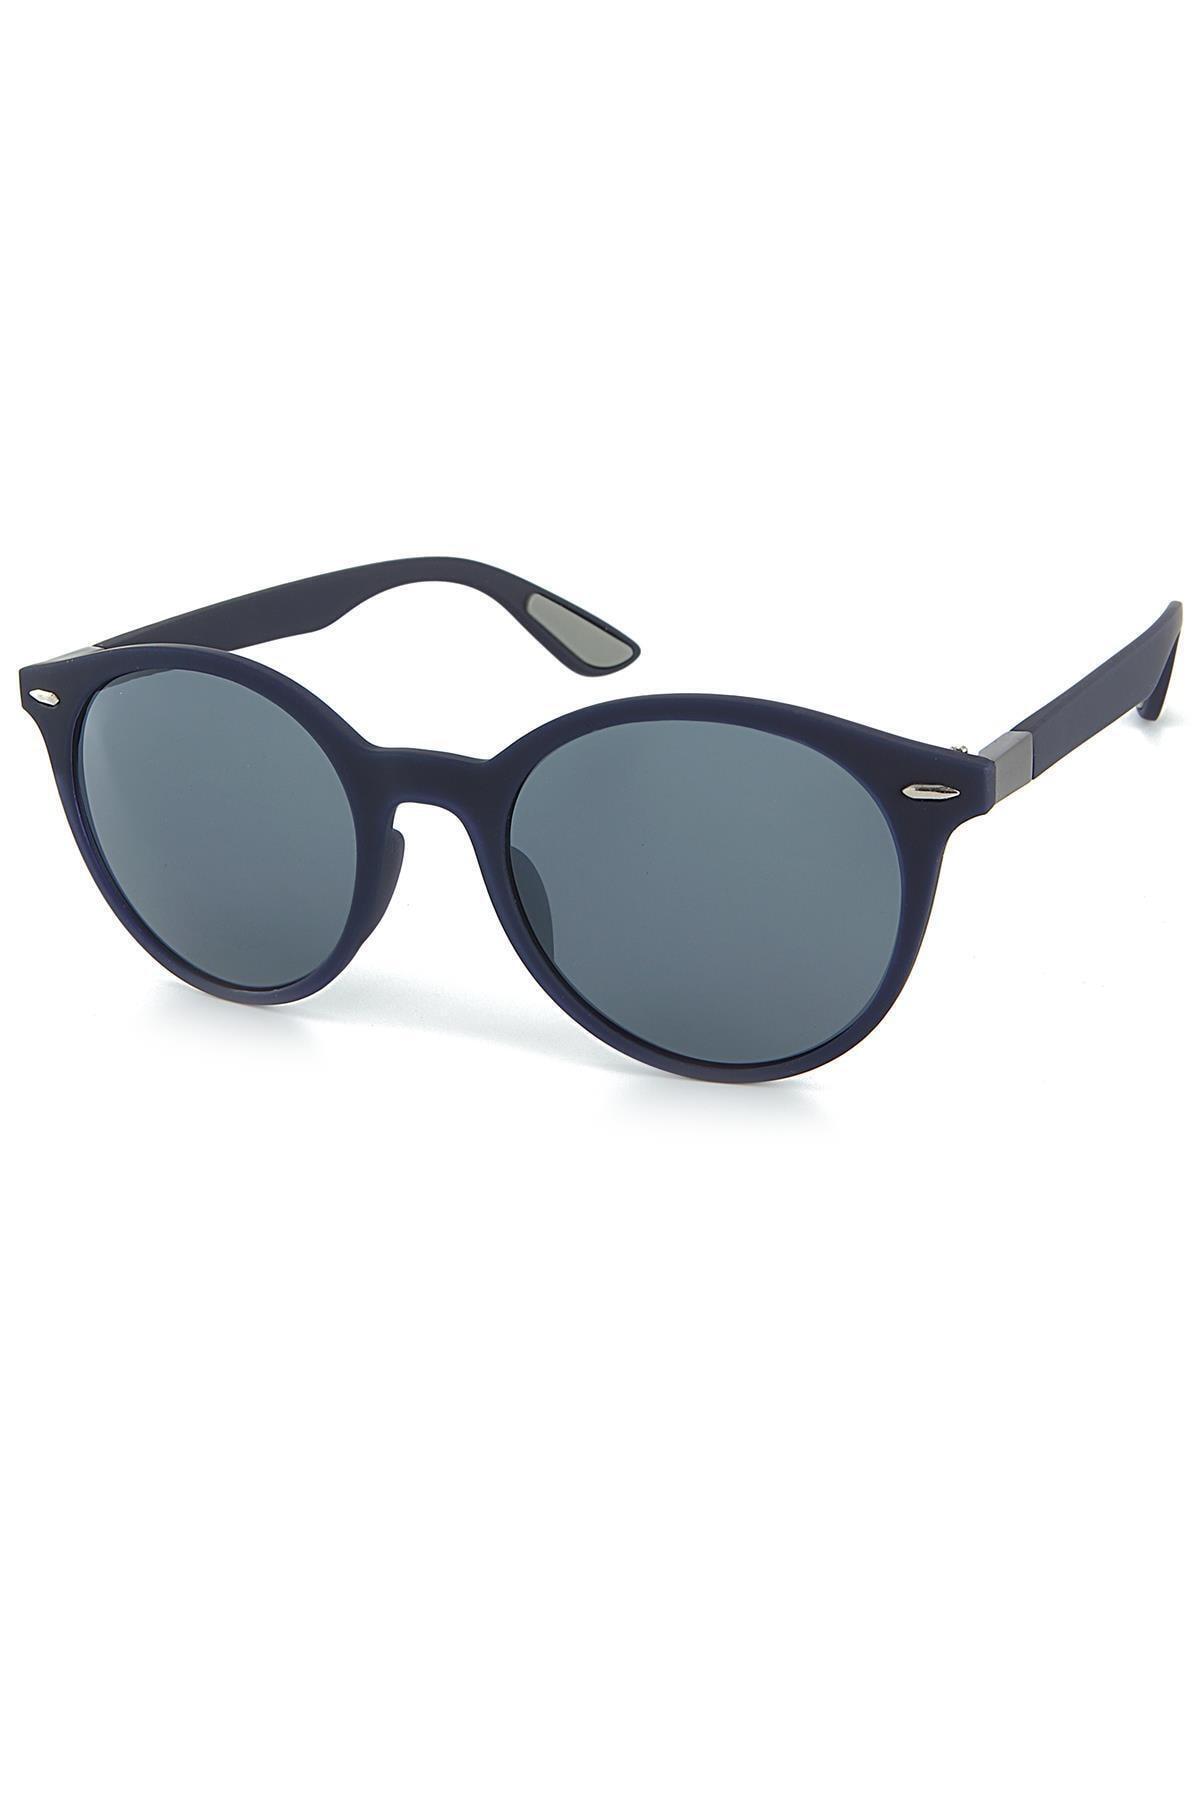 عینک آفتابی زنانه مدل برند Luis Polo رنگ لاجوردی کد ty90250874